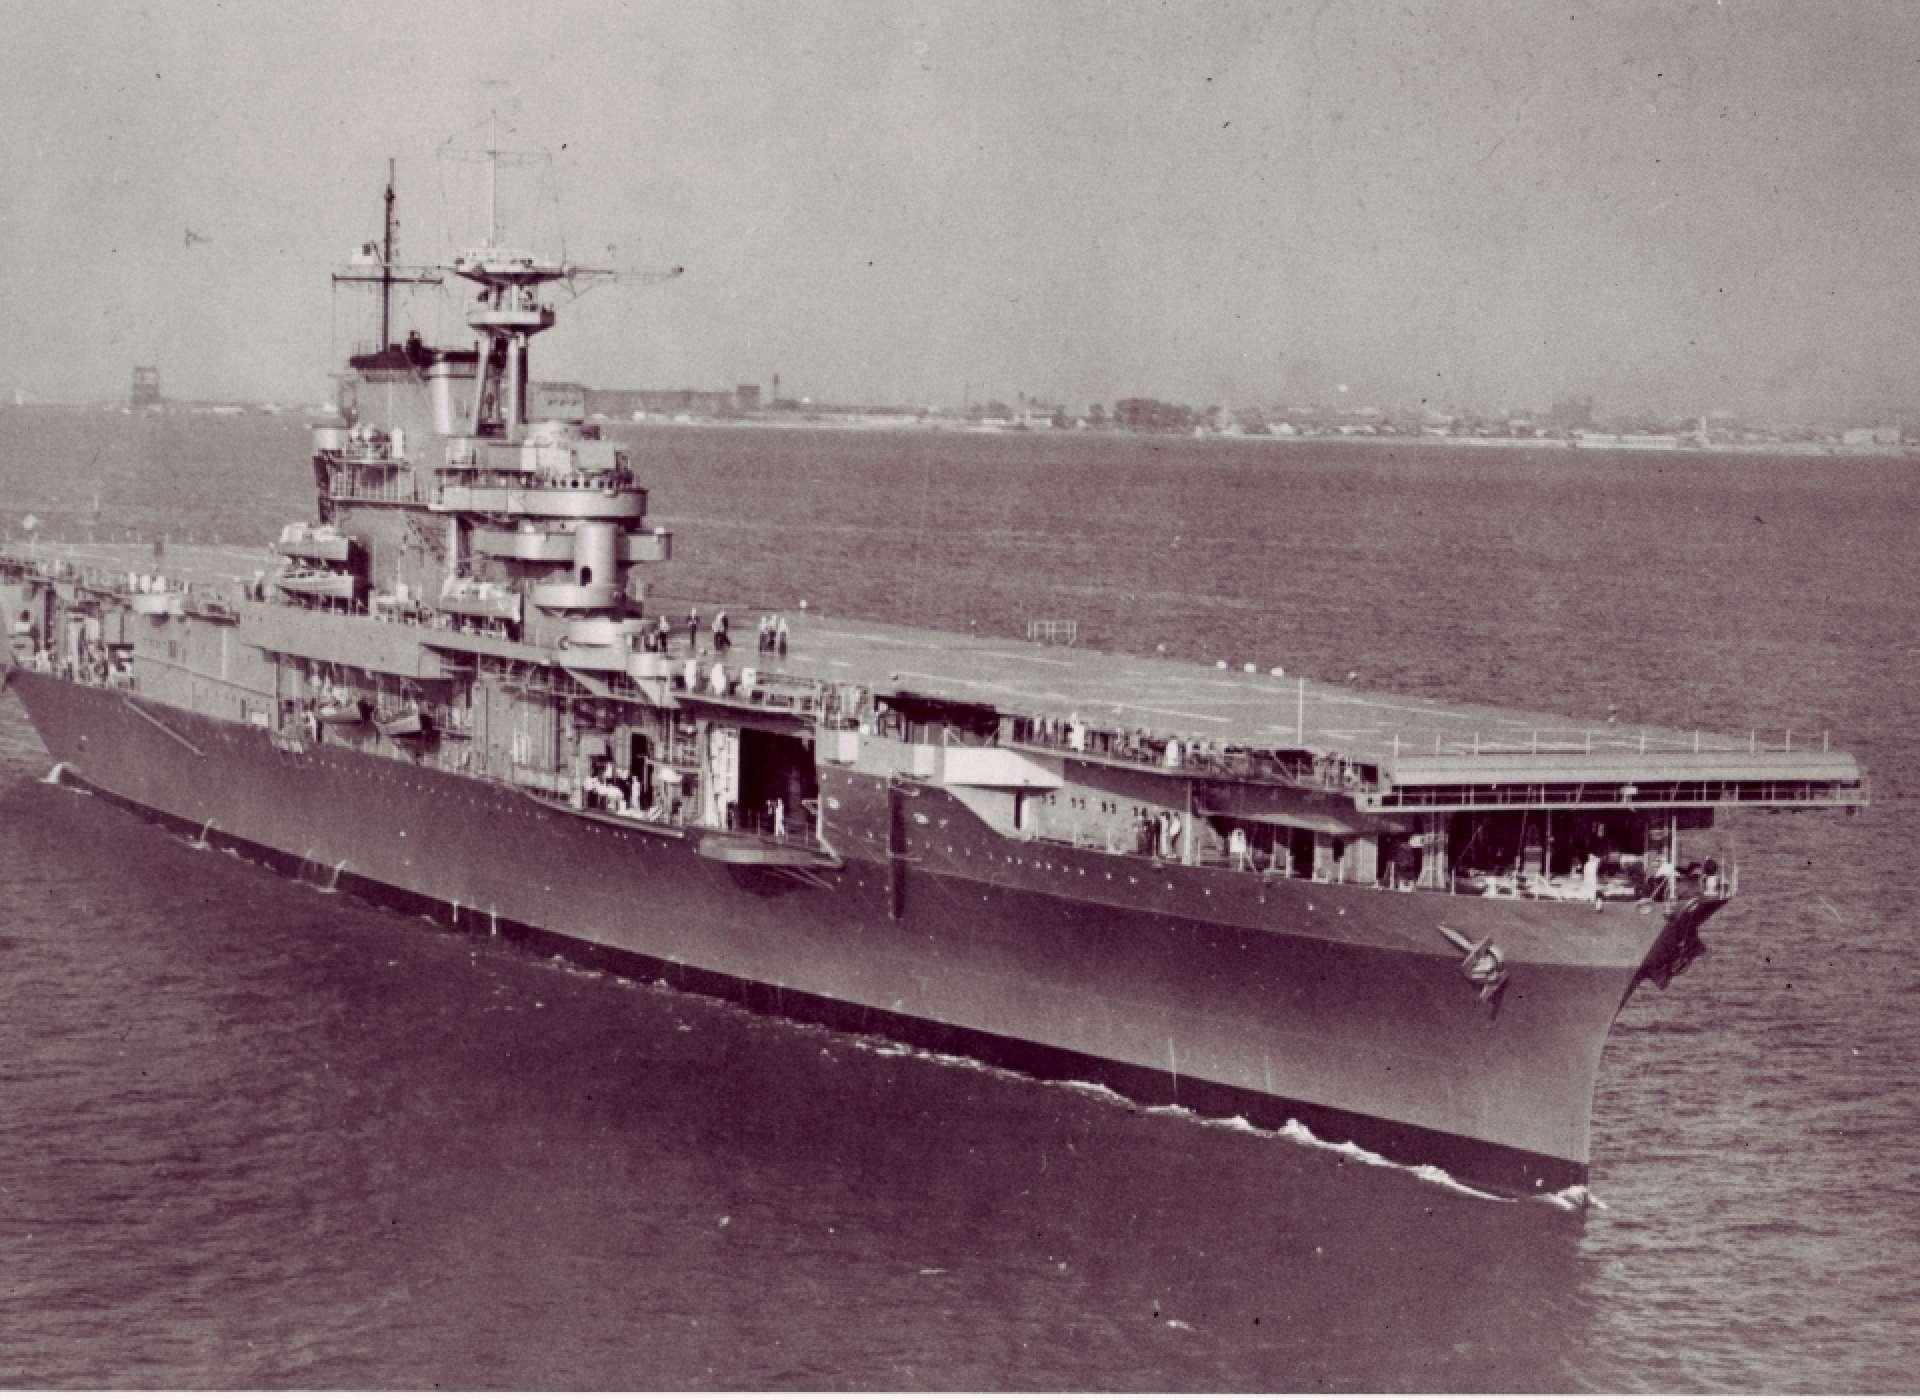 An Eyewitness to the USS Hornet's Last Battle | The National